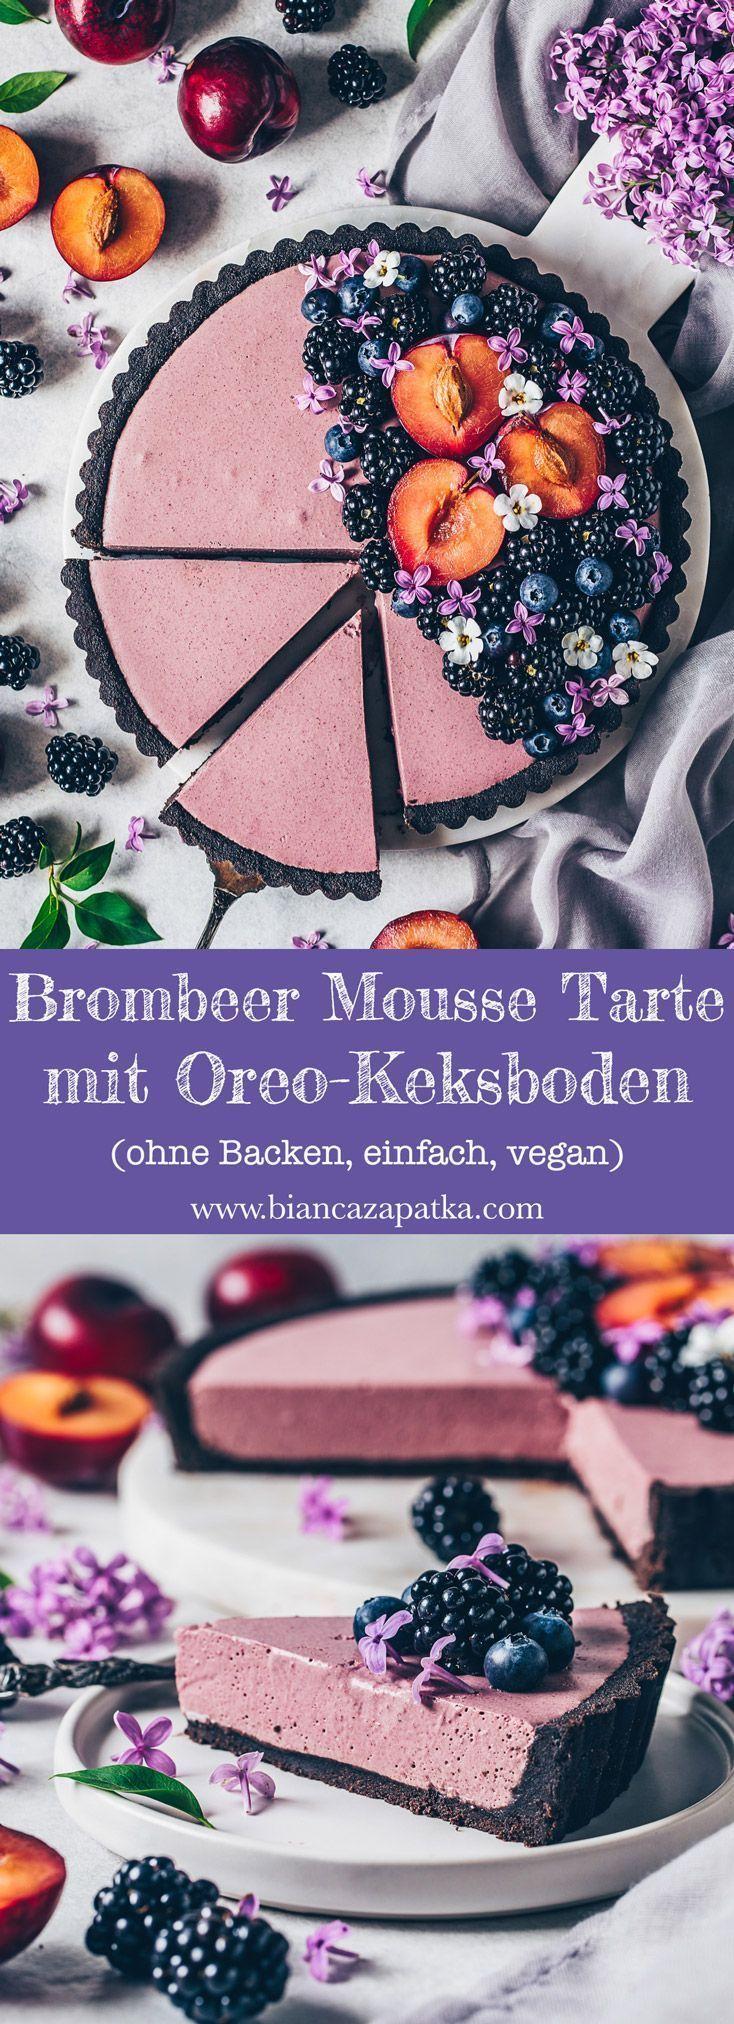 Brombeer Mousse Tarte - ohne Backen, vegan - Bianca Zapatka | Rezepte